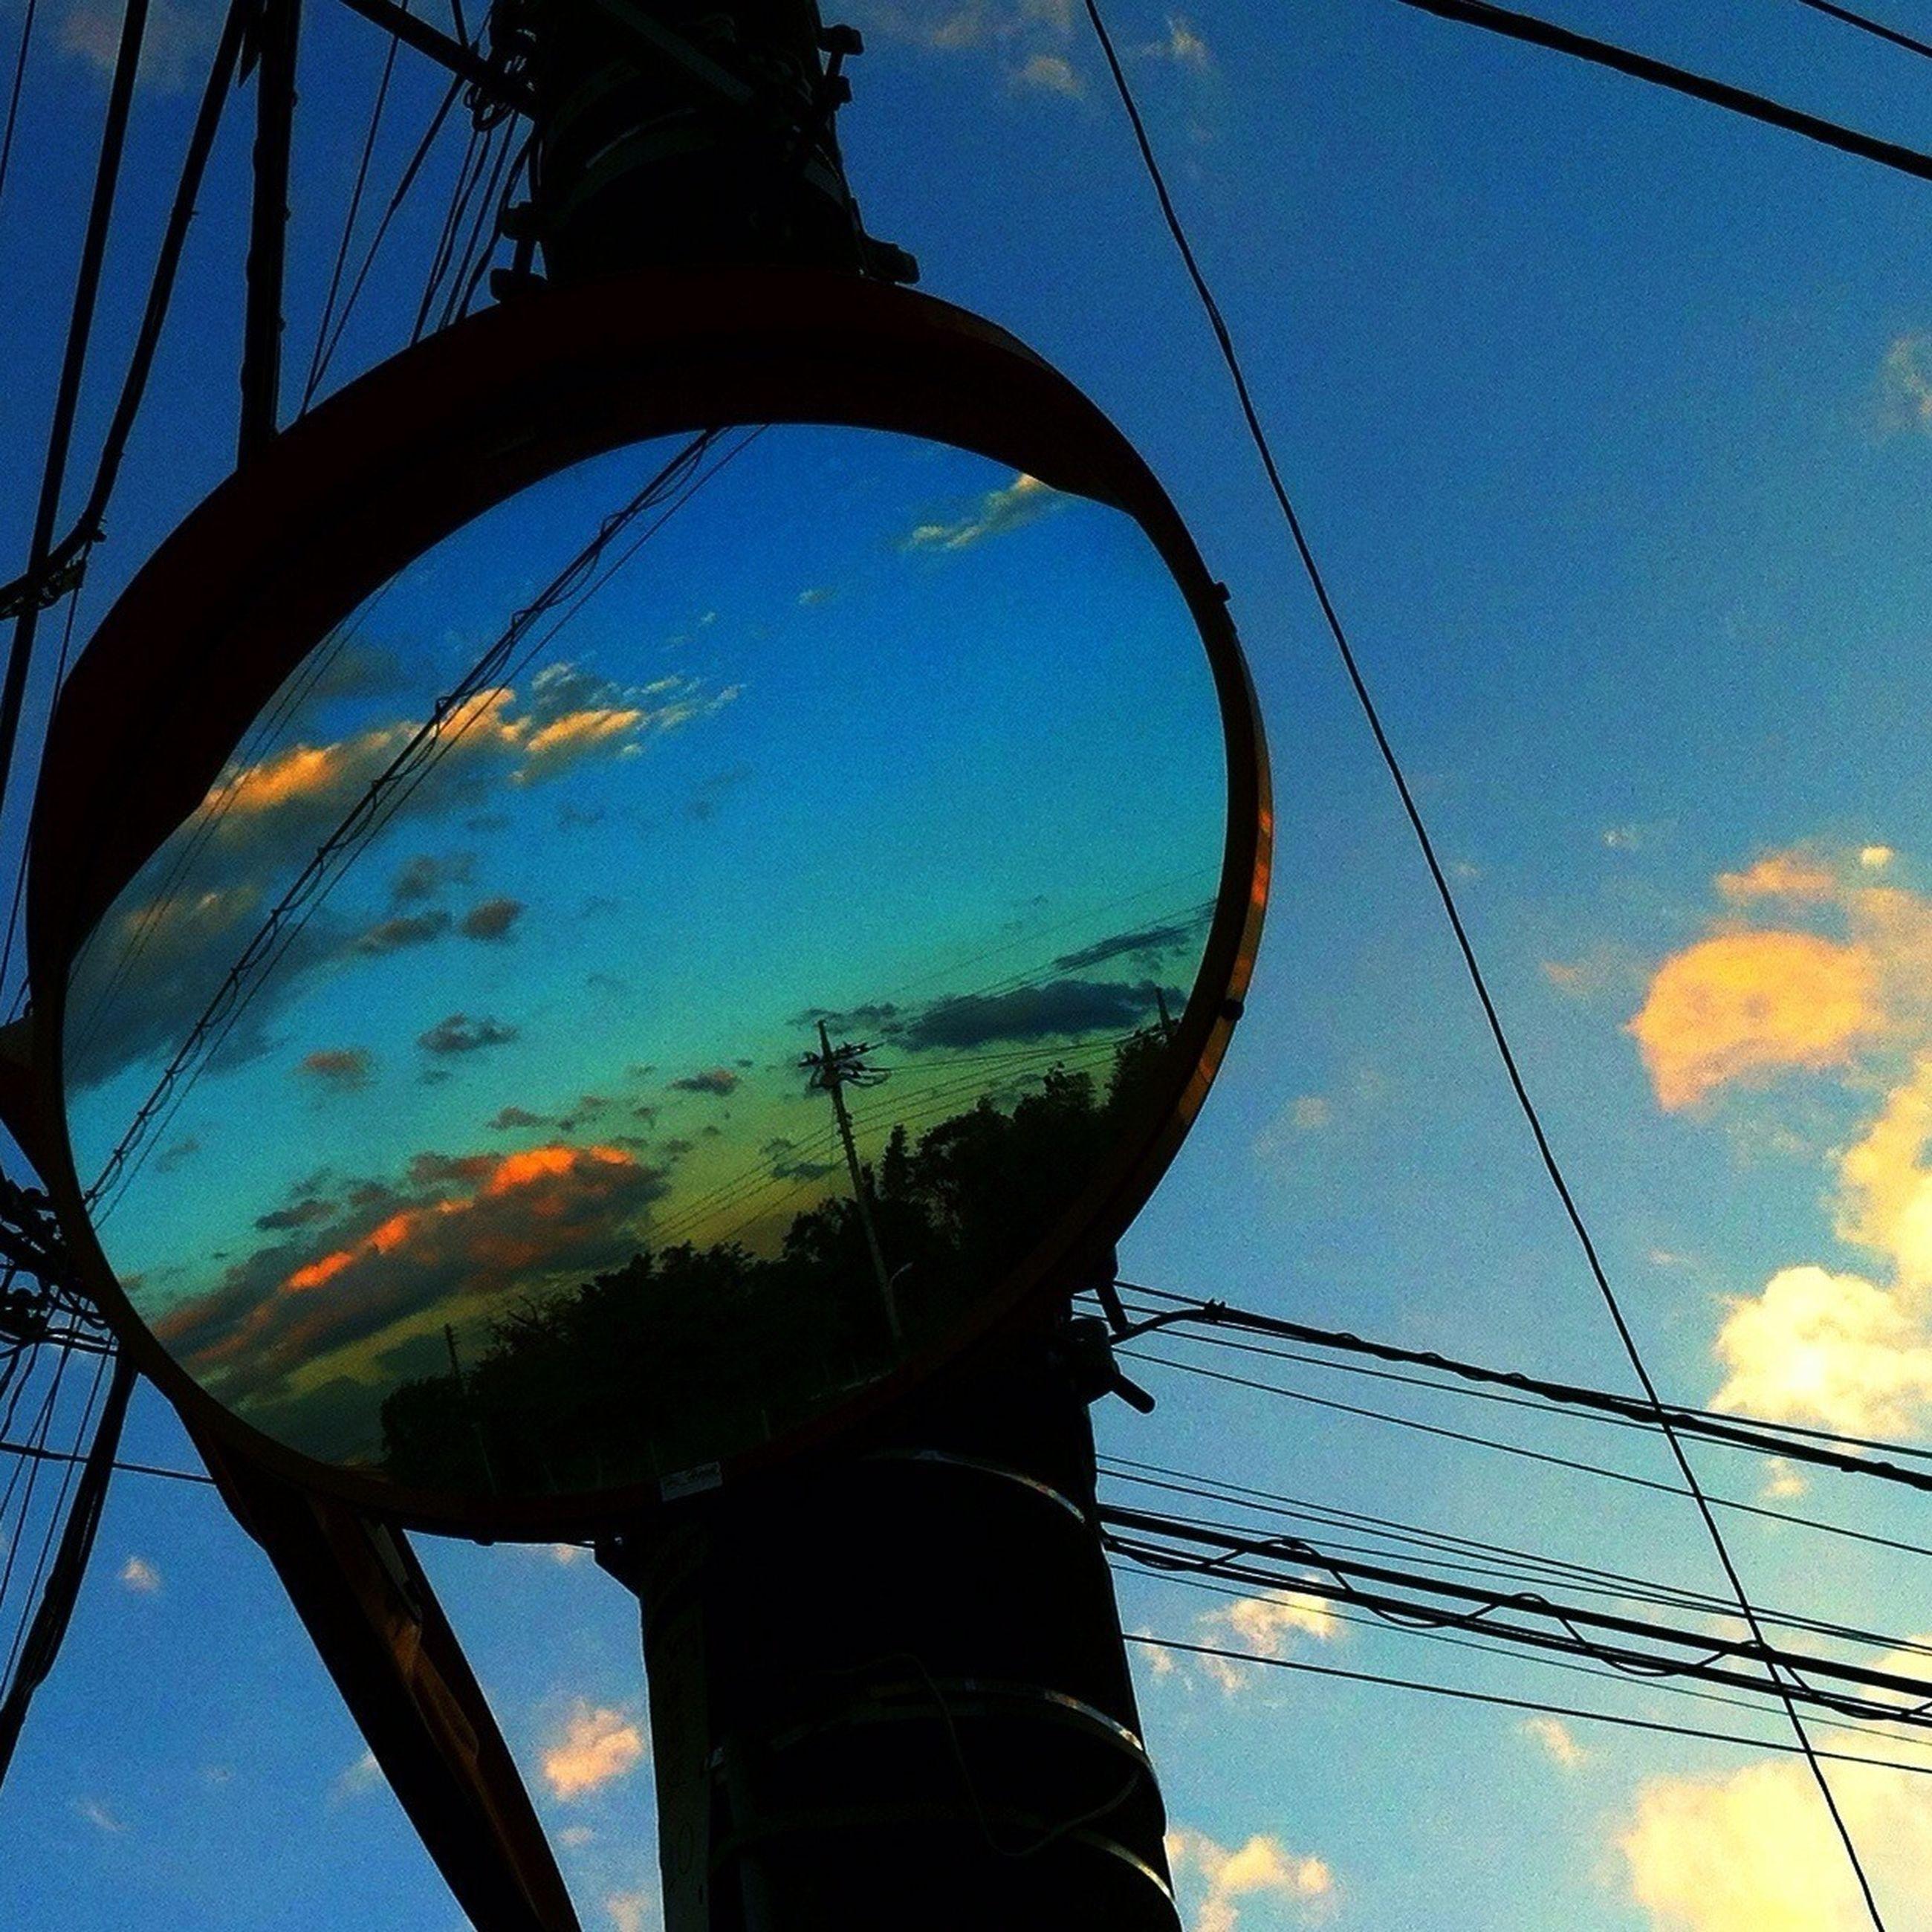 low angle view, sky, blue, part of, cloud - sky, transportation, cloud, connection, power line, metal, electricity, amusement park, outdoors, power supply, electricity pylon, ferris wheel, cable, no people, close-up, circle